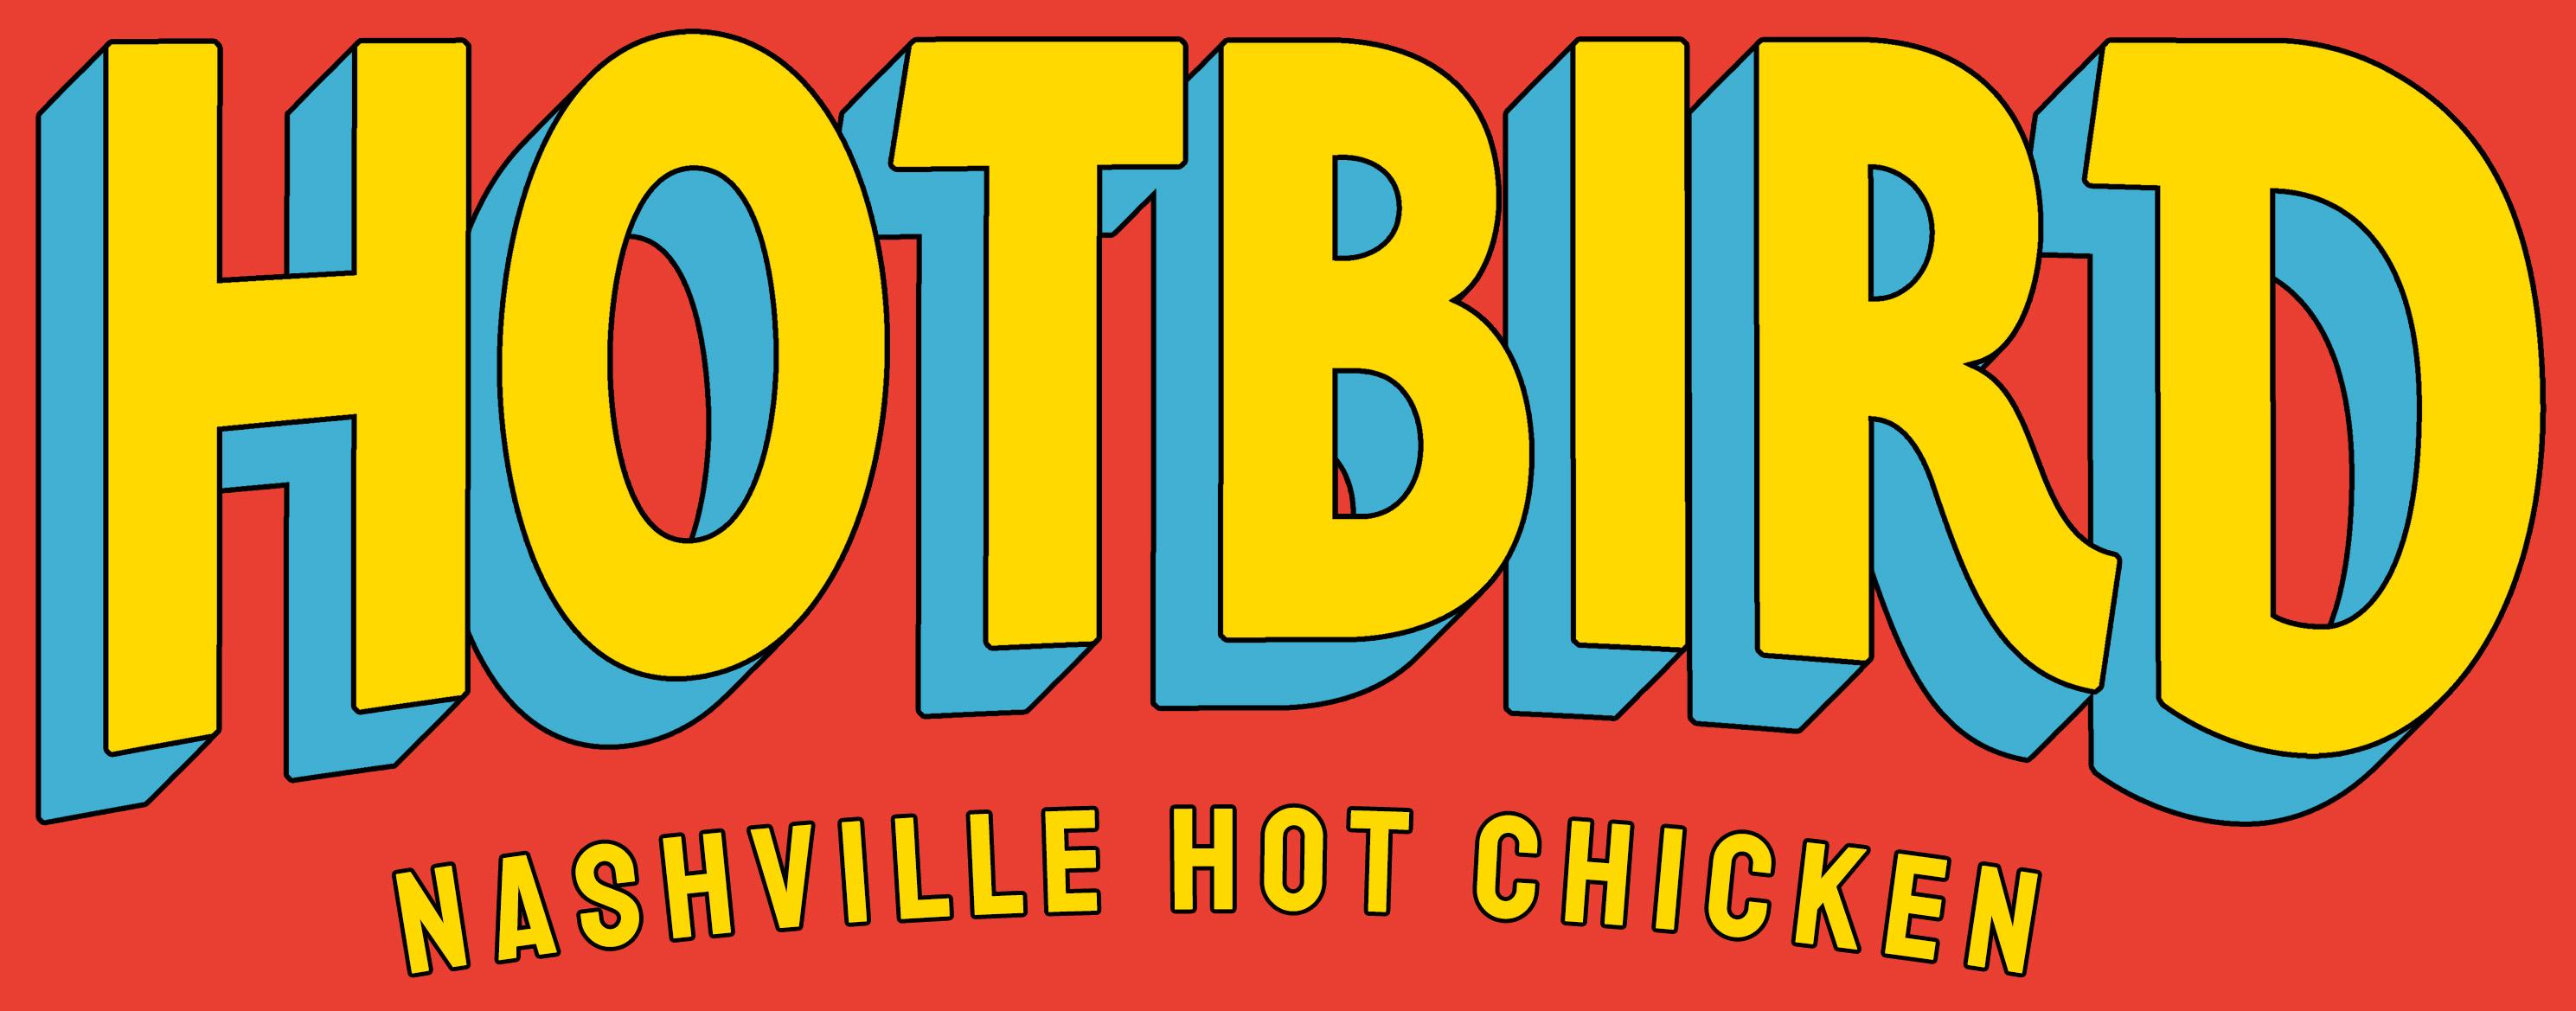 hotbird nashville hot chicken